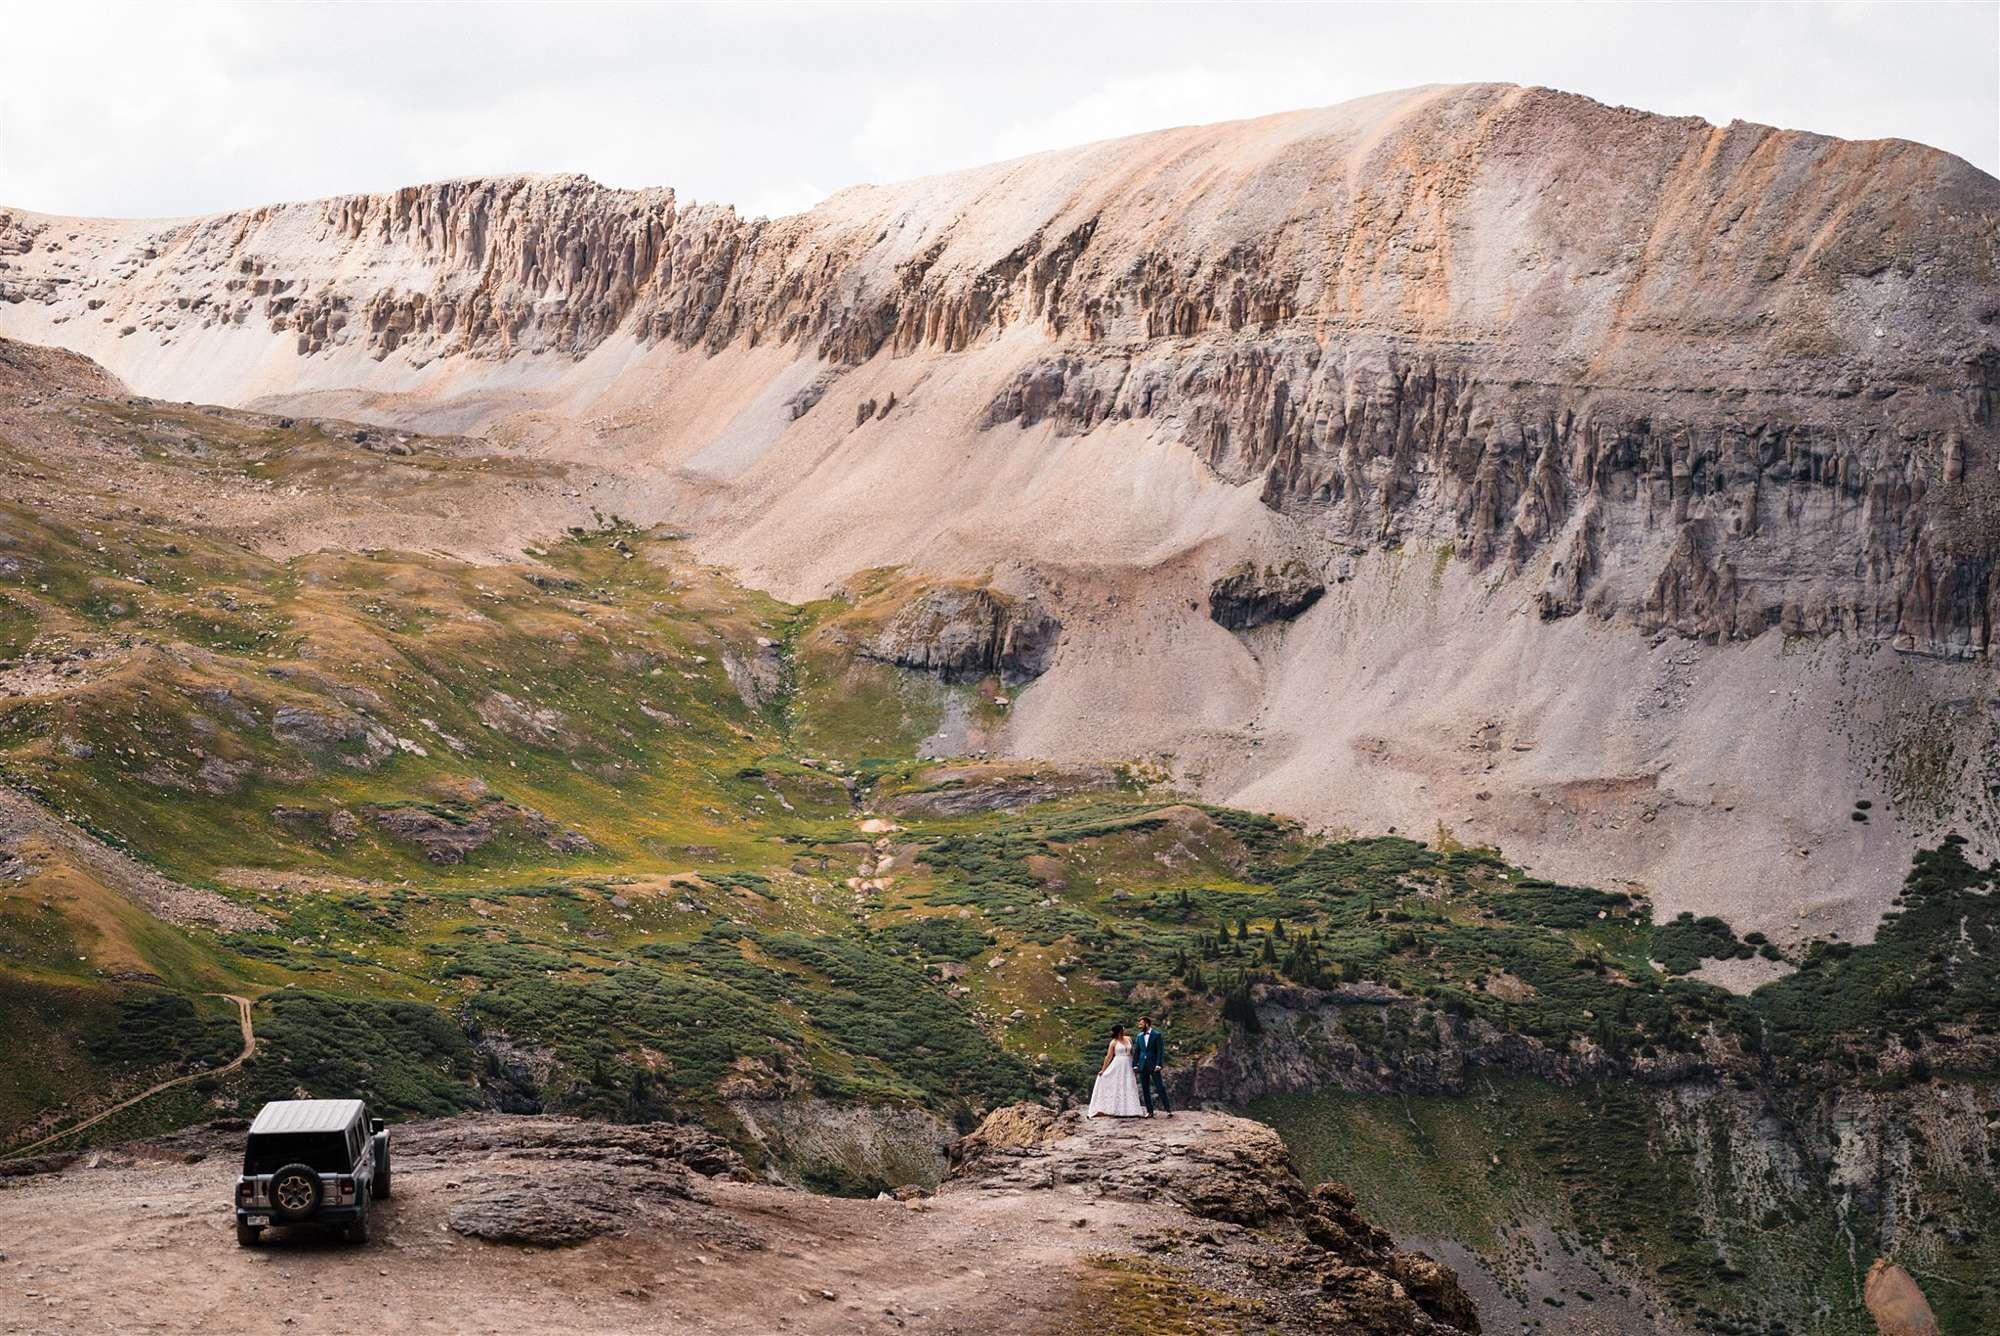 Colorado_Jeeping_Elopement_Emily_Matt_The_Foxes_Photography_0013.jpg